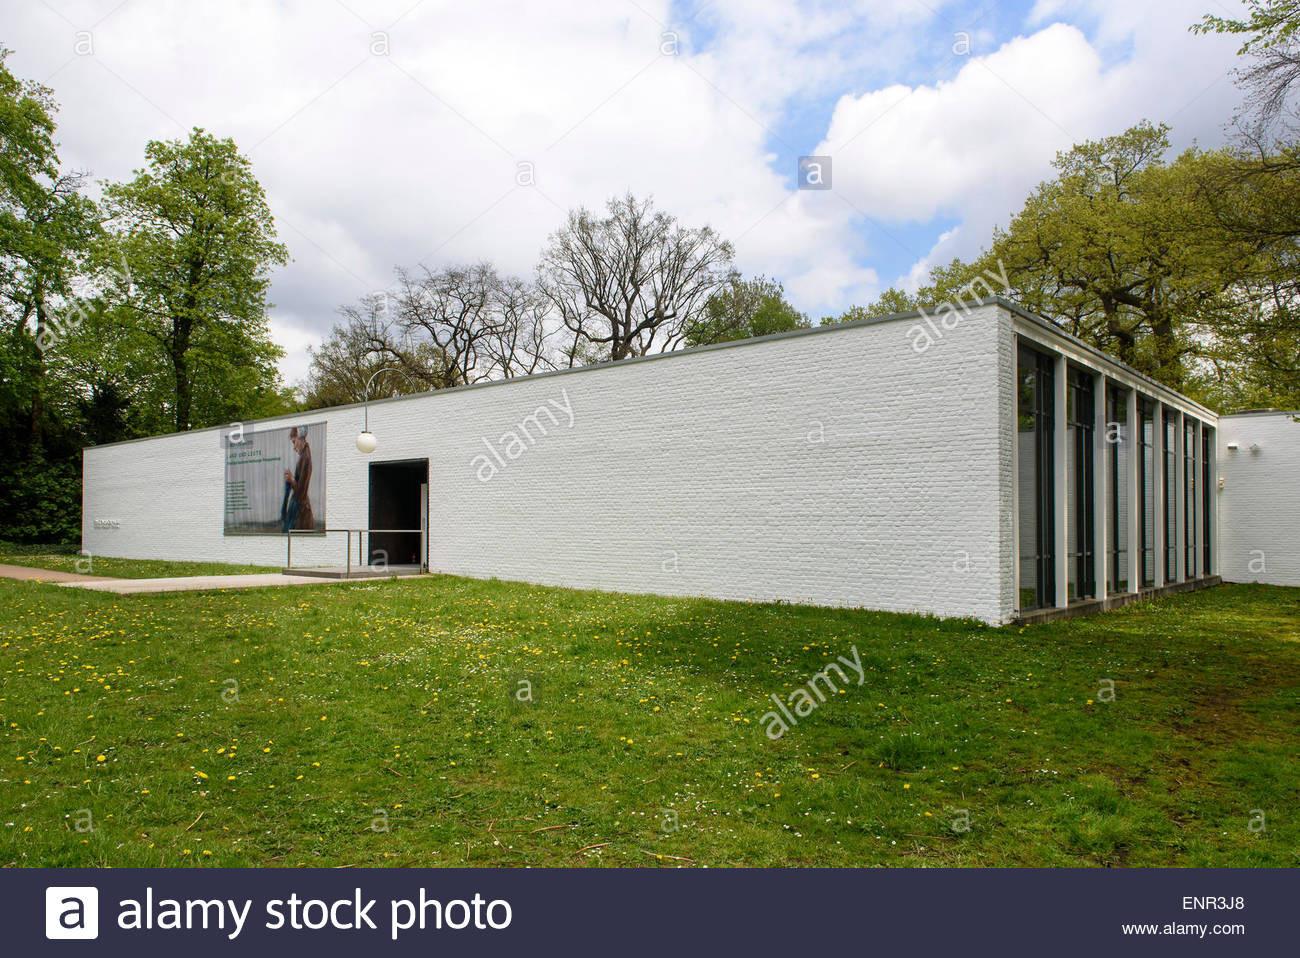 Ernst Barlach Haus  Ernst Barlach House in the Jenischpark built 1962 by